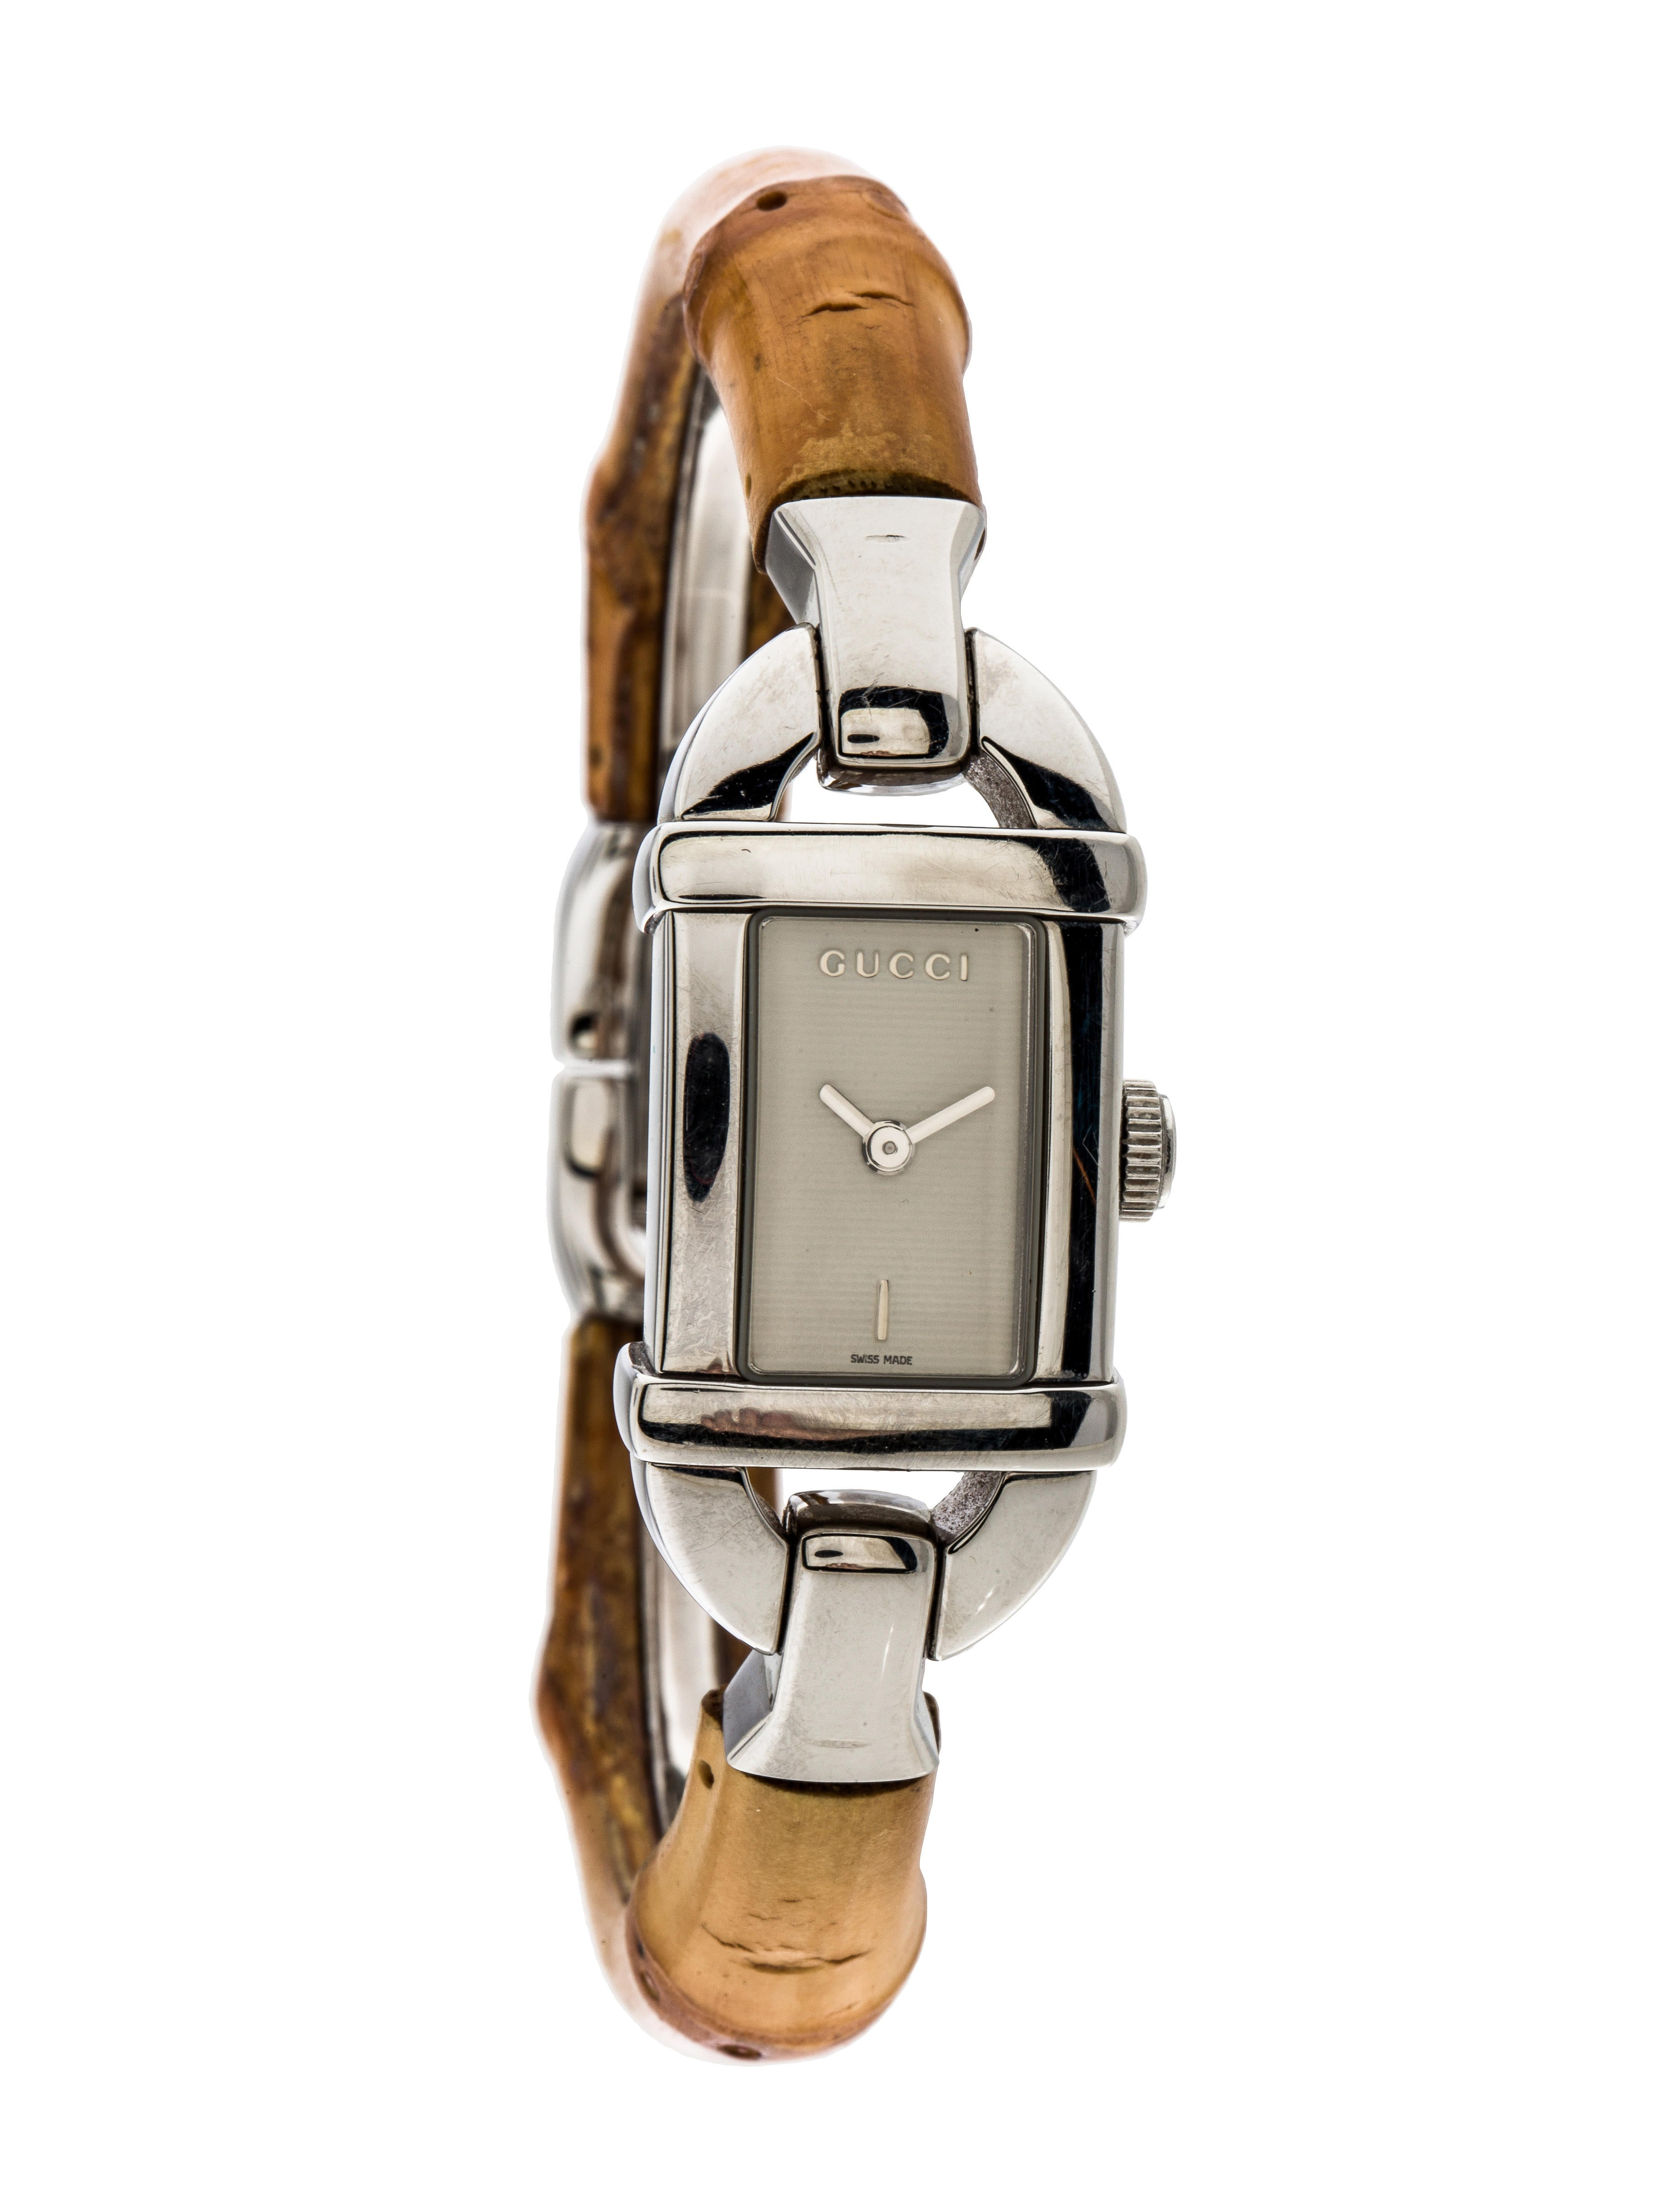 4b05b3880e2 Gucci Bamboo Watch - Bracelet - GUC126551